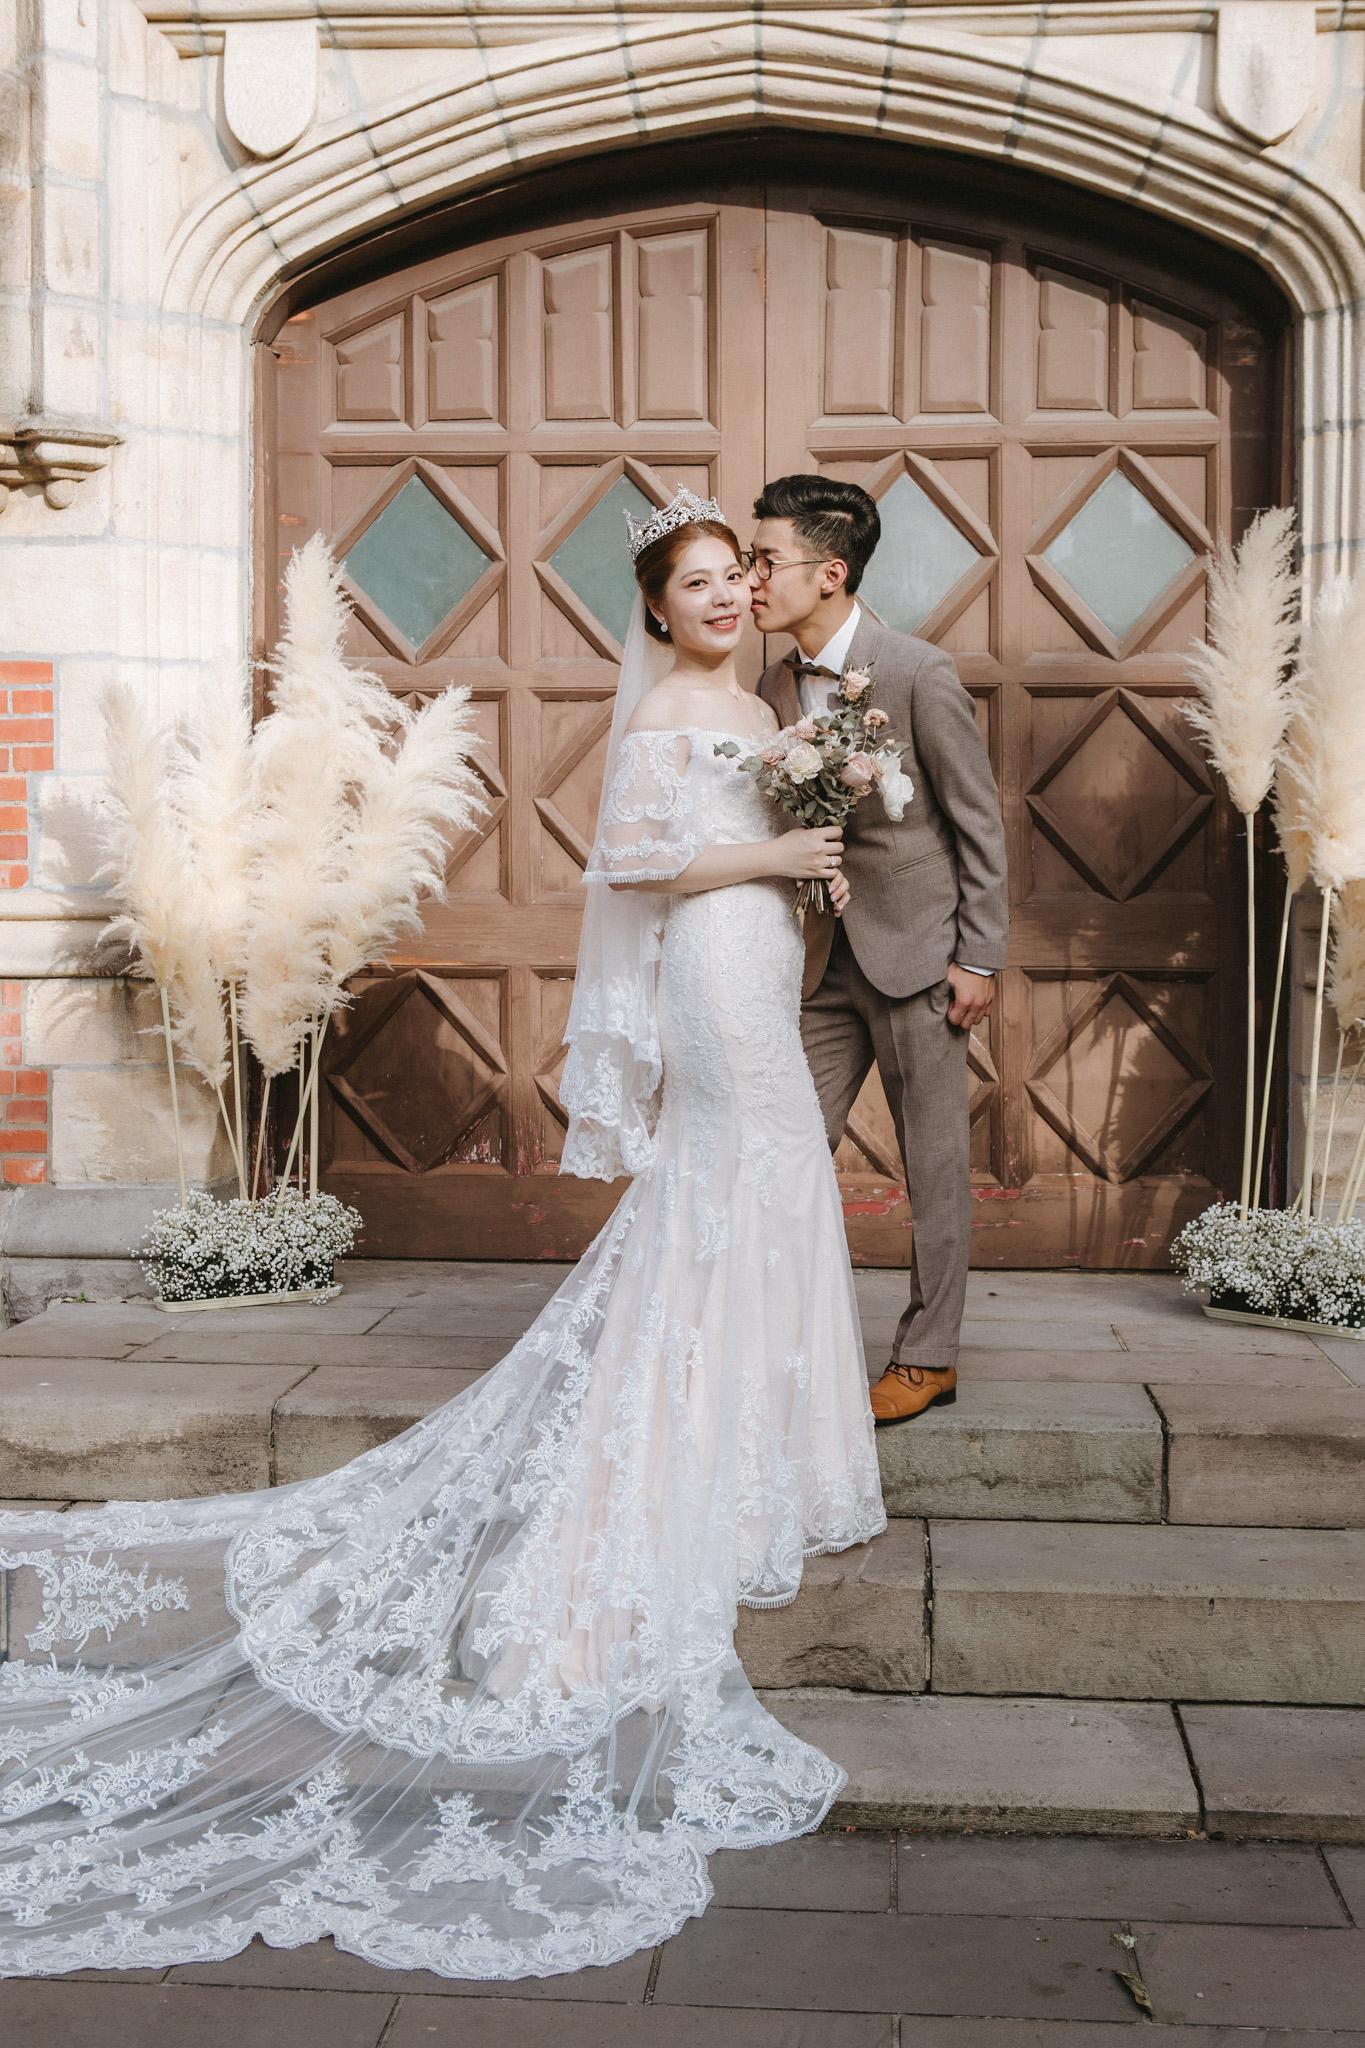 EW 台北婚攝 居米 濟南教會 Brick Yard 33 美軍俱樂部 婚禮 婚宴-53